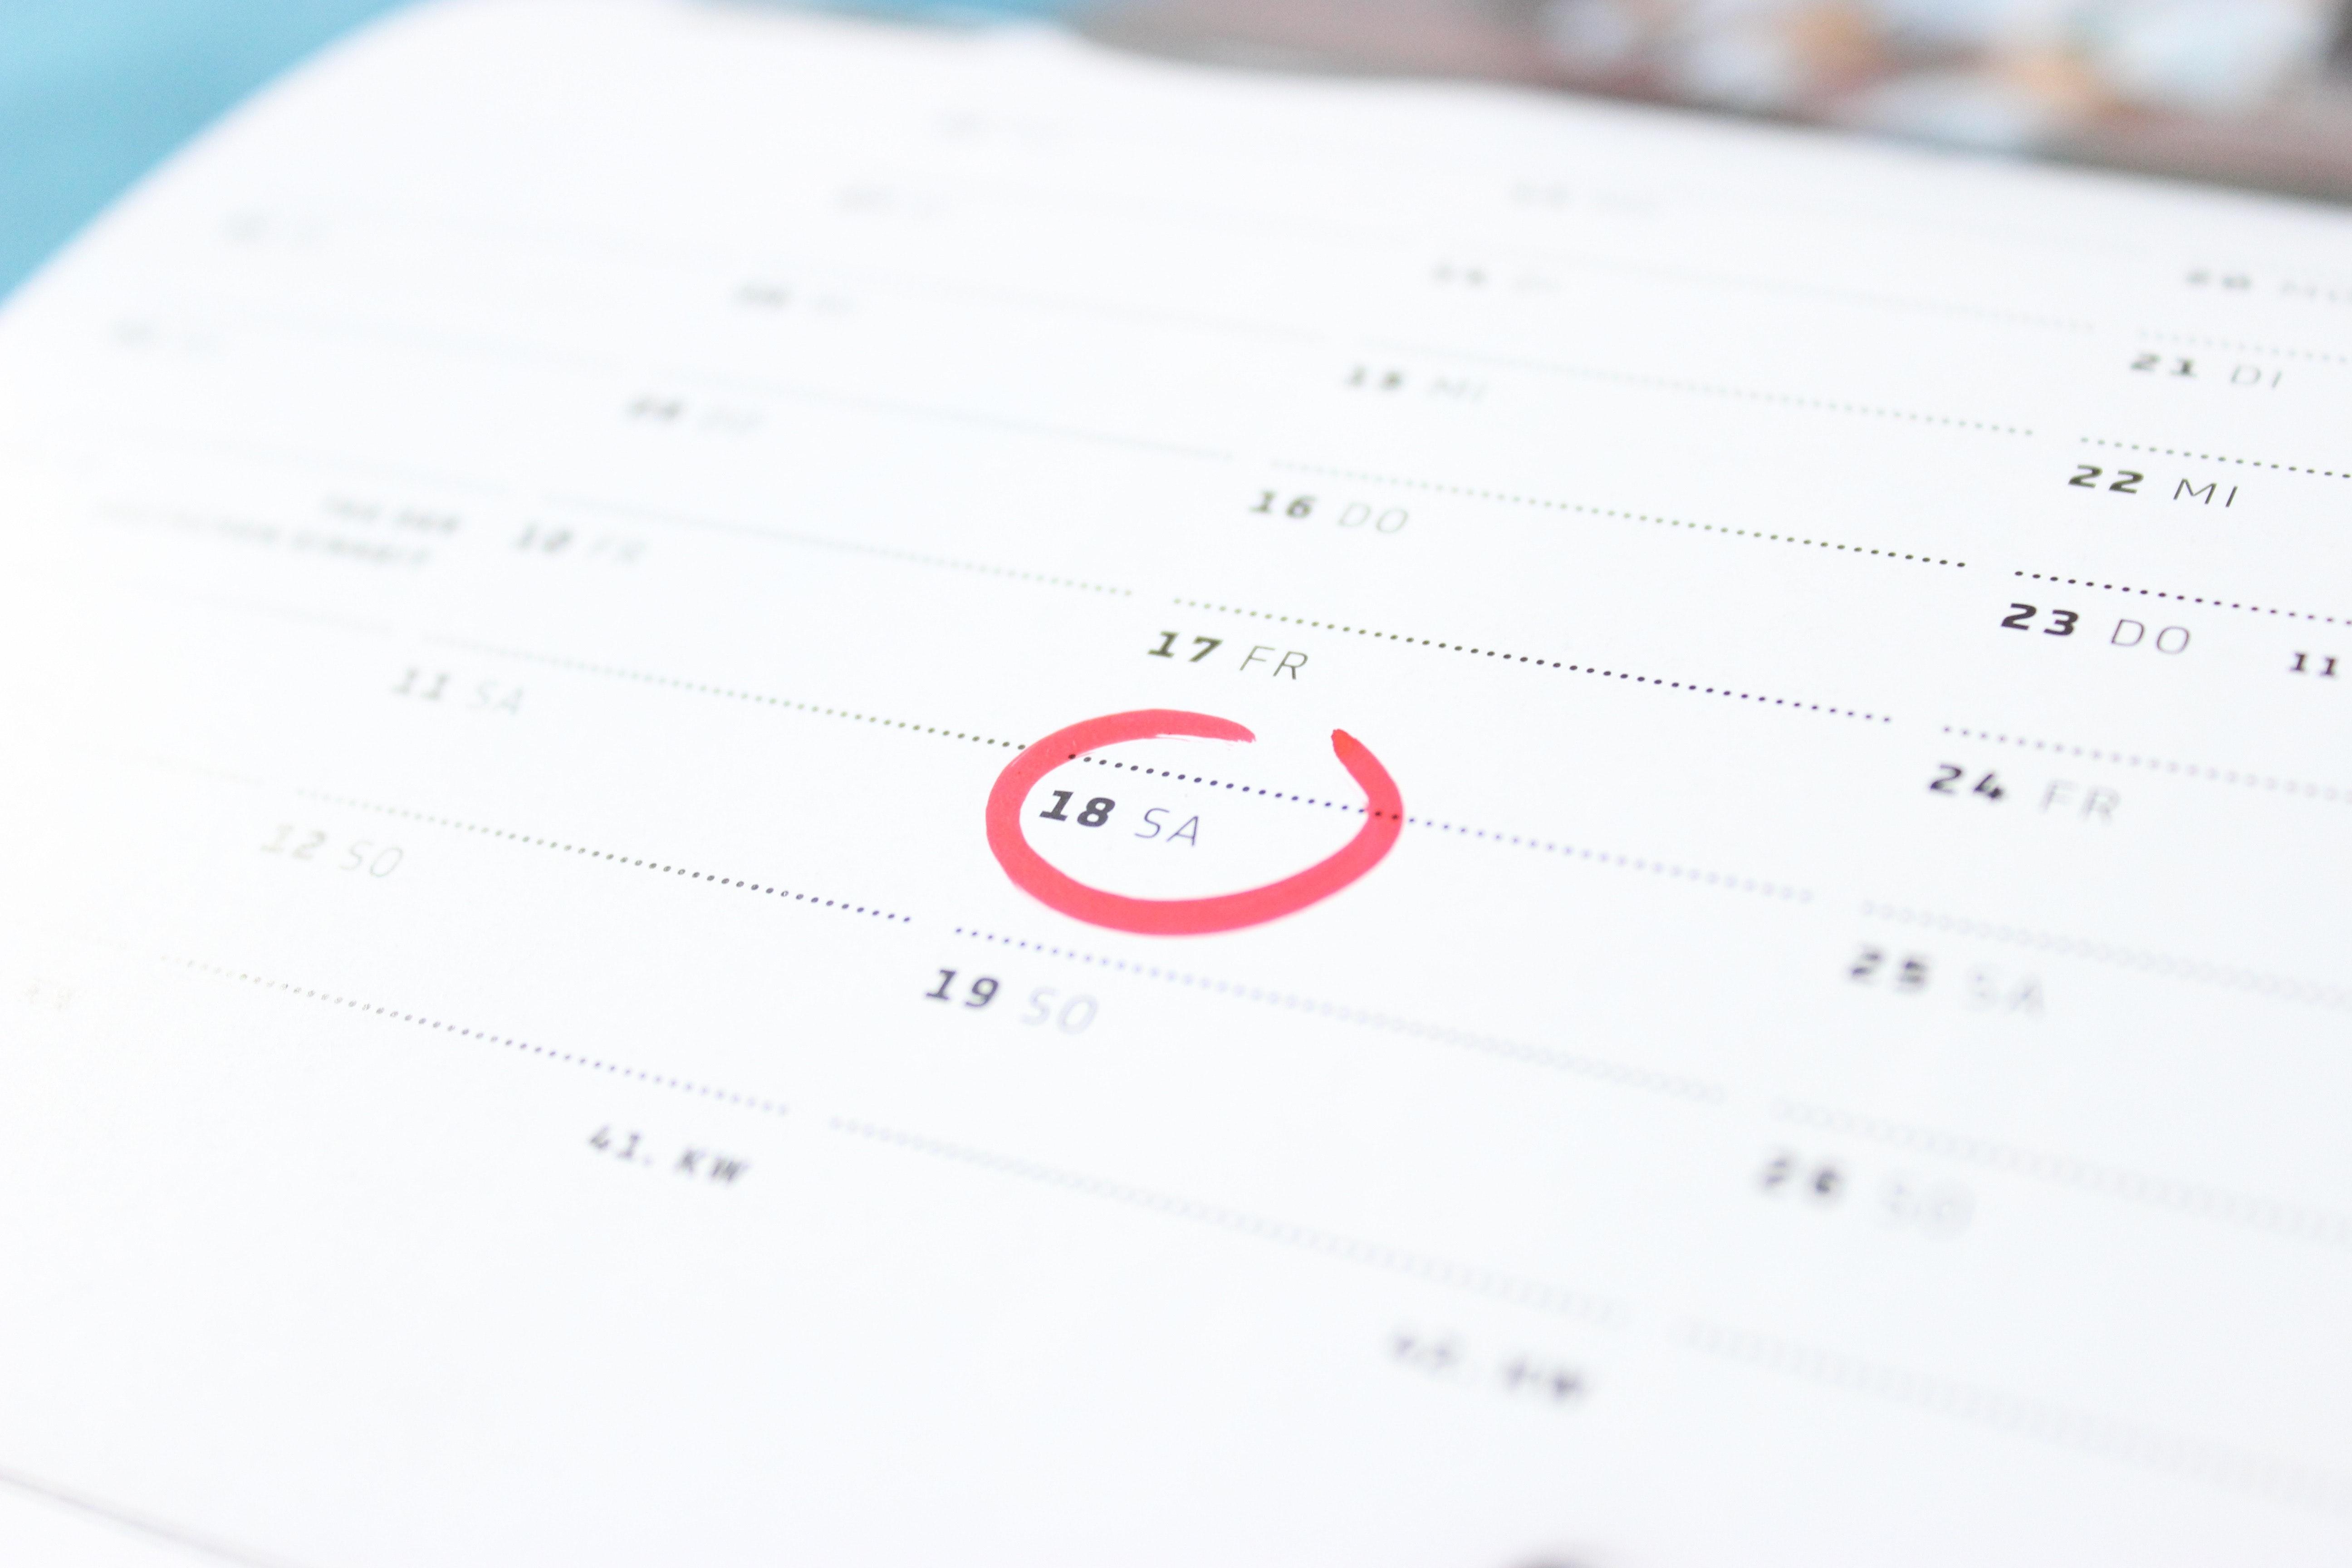 agenda-appointment-calendar-60032